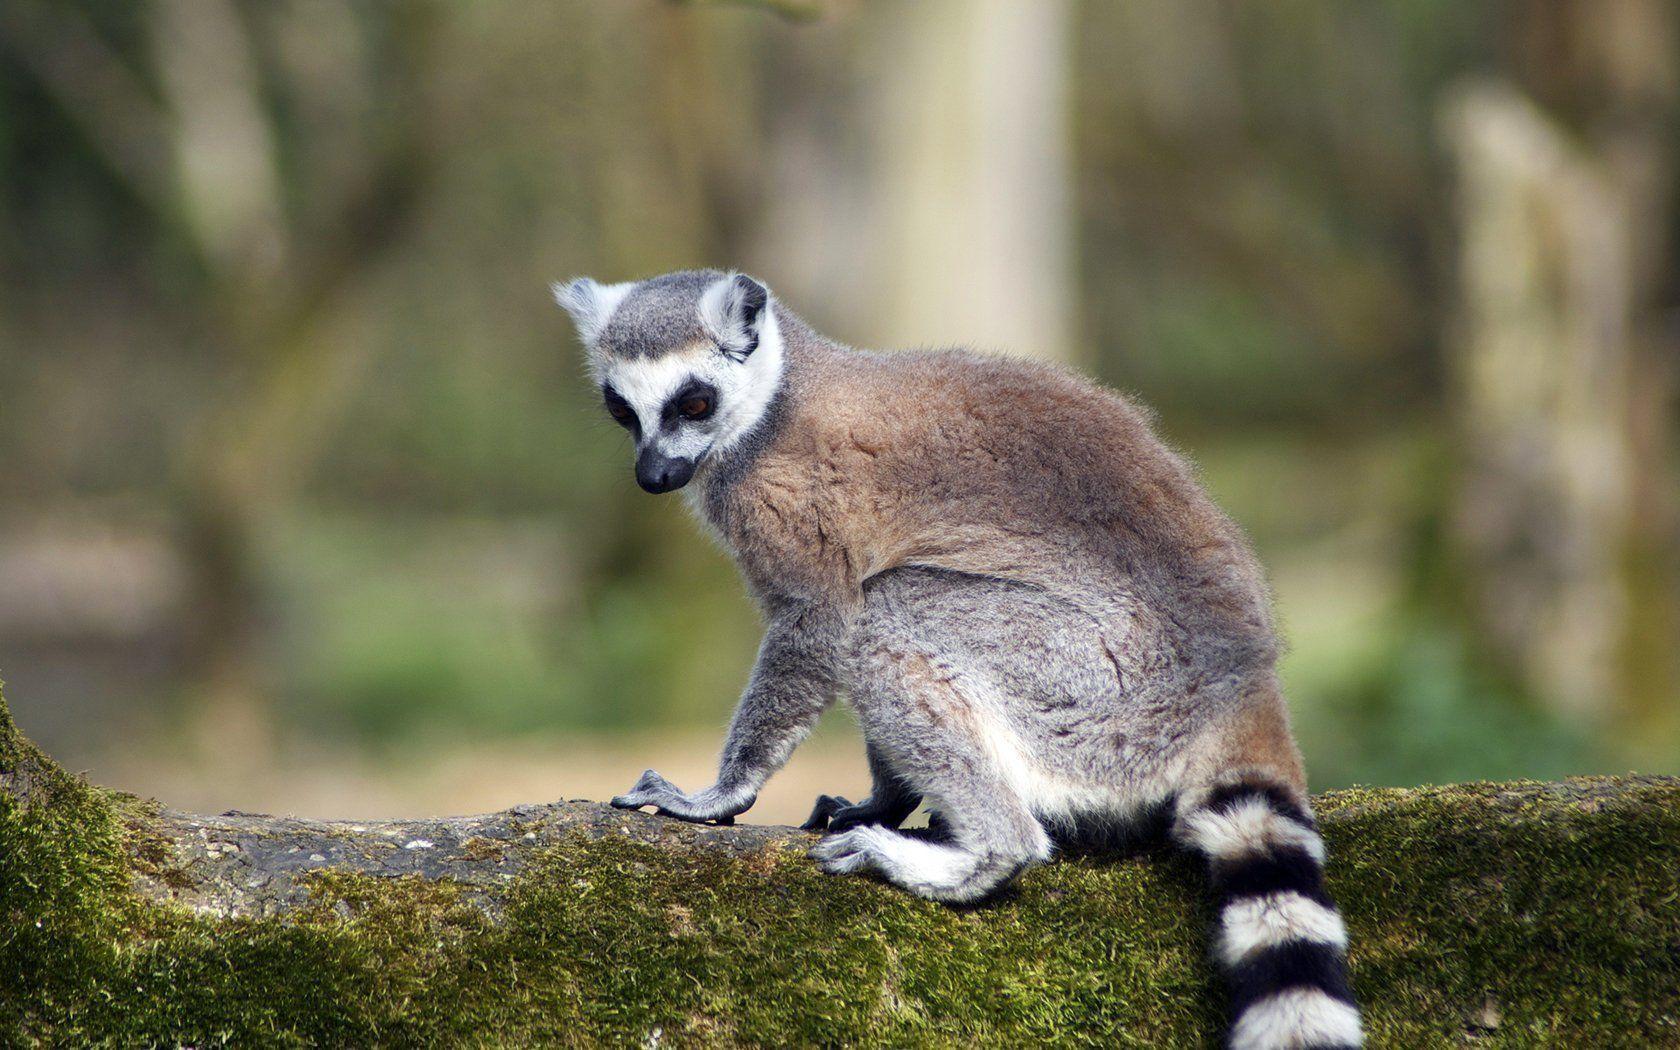 download wallpaper 3840x2160 lemur - photo #20